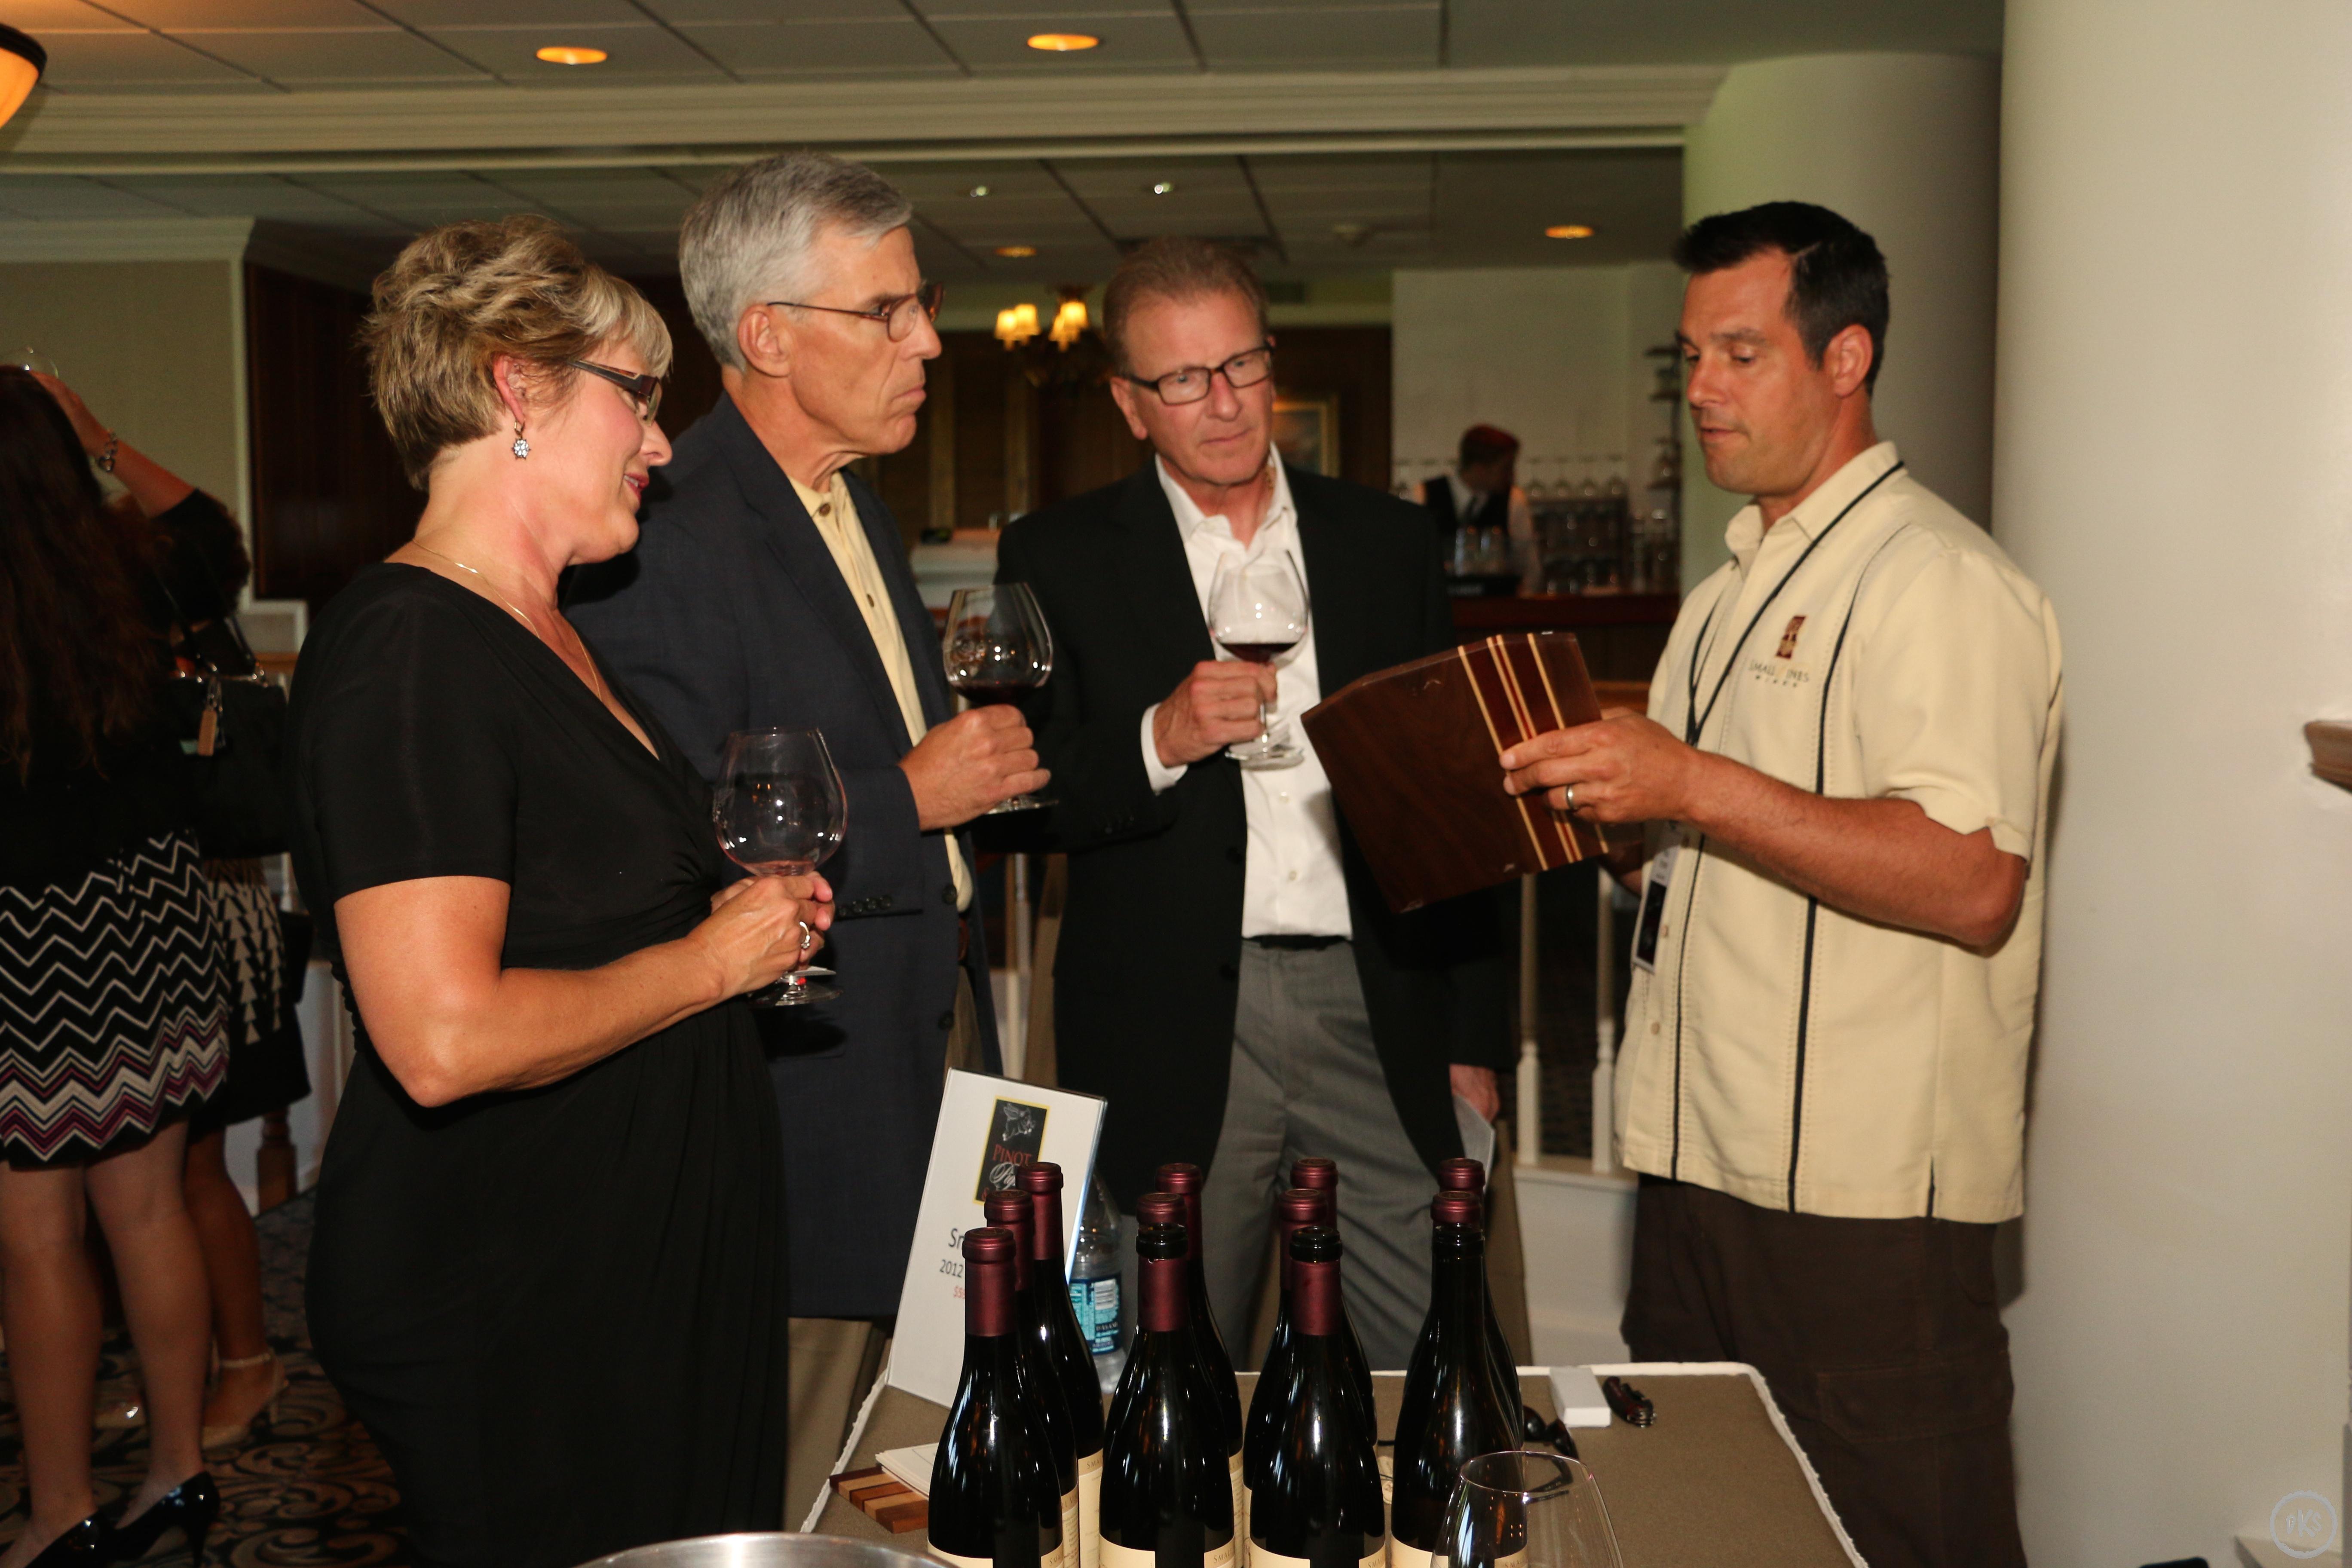 Guests Wine